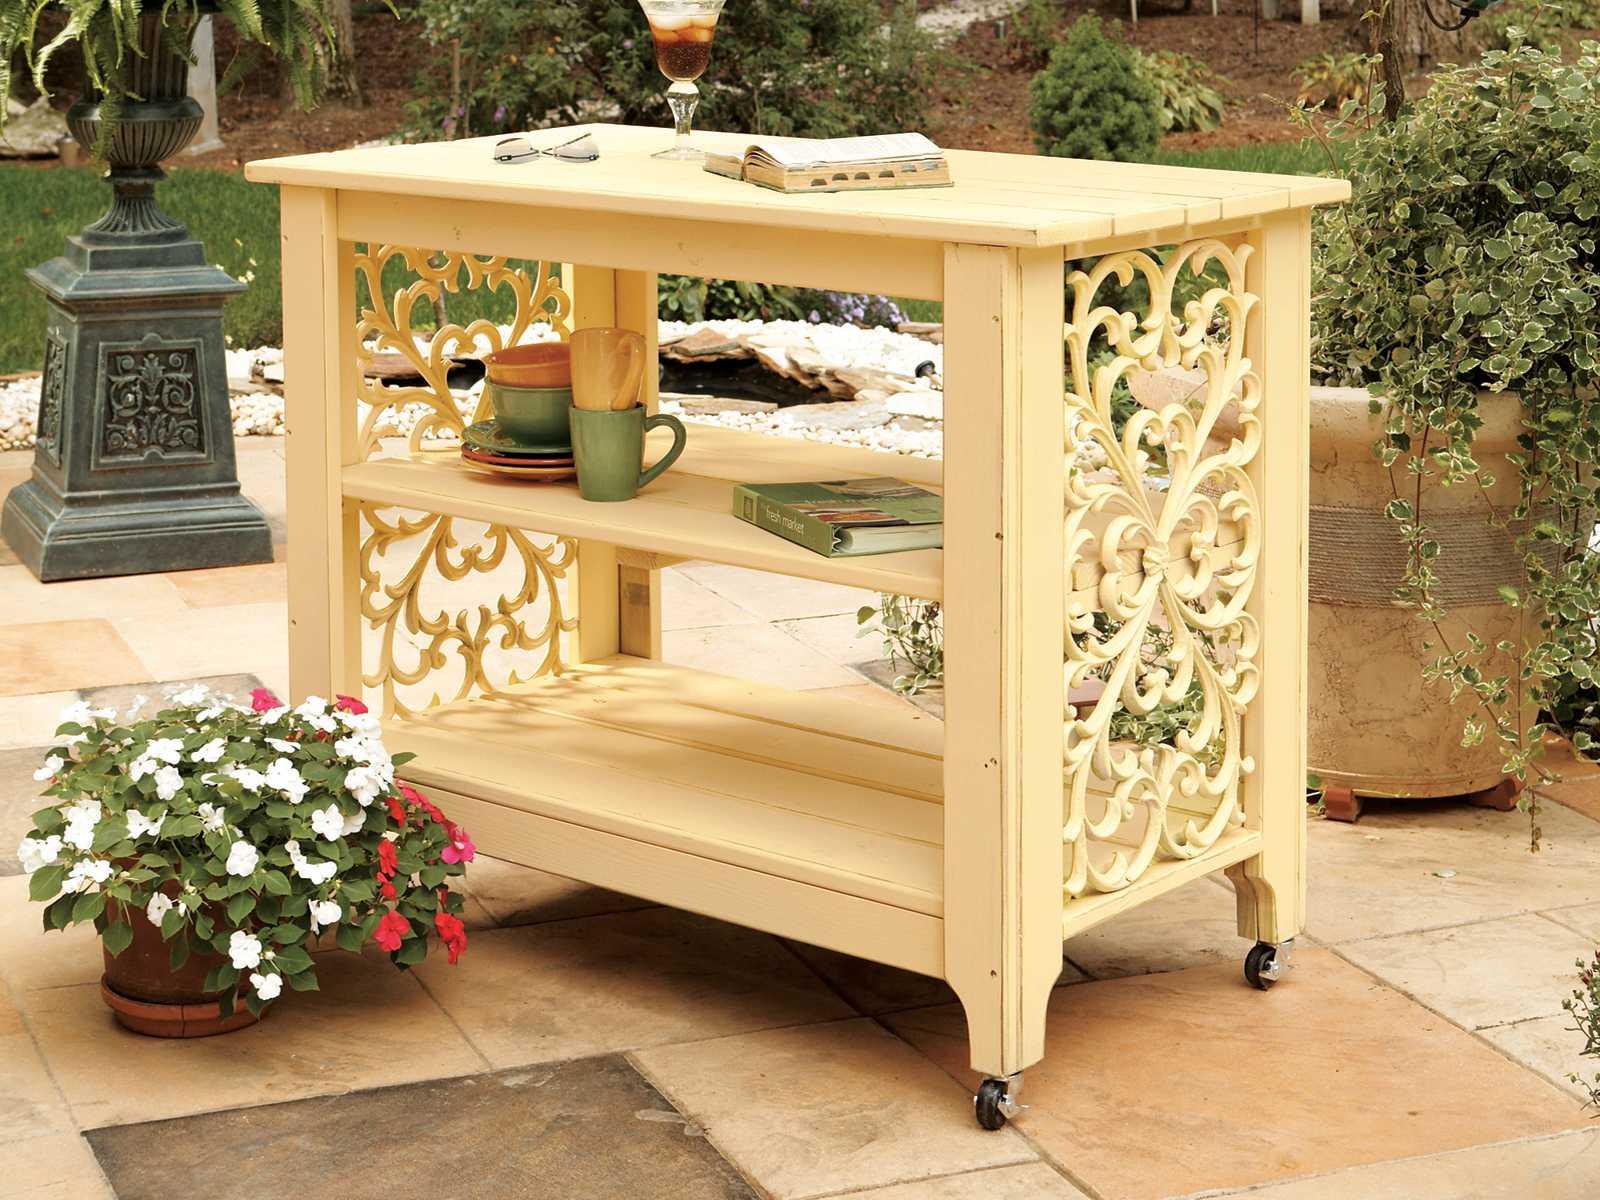 lifetime adirondack chairs hanging chair stand plans uwharrie veranda wood serving cart | uwv090